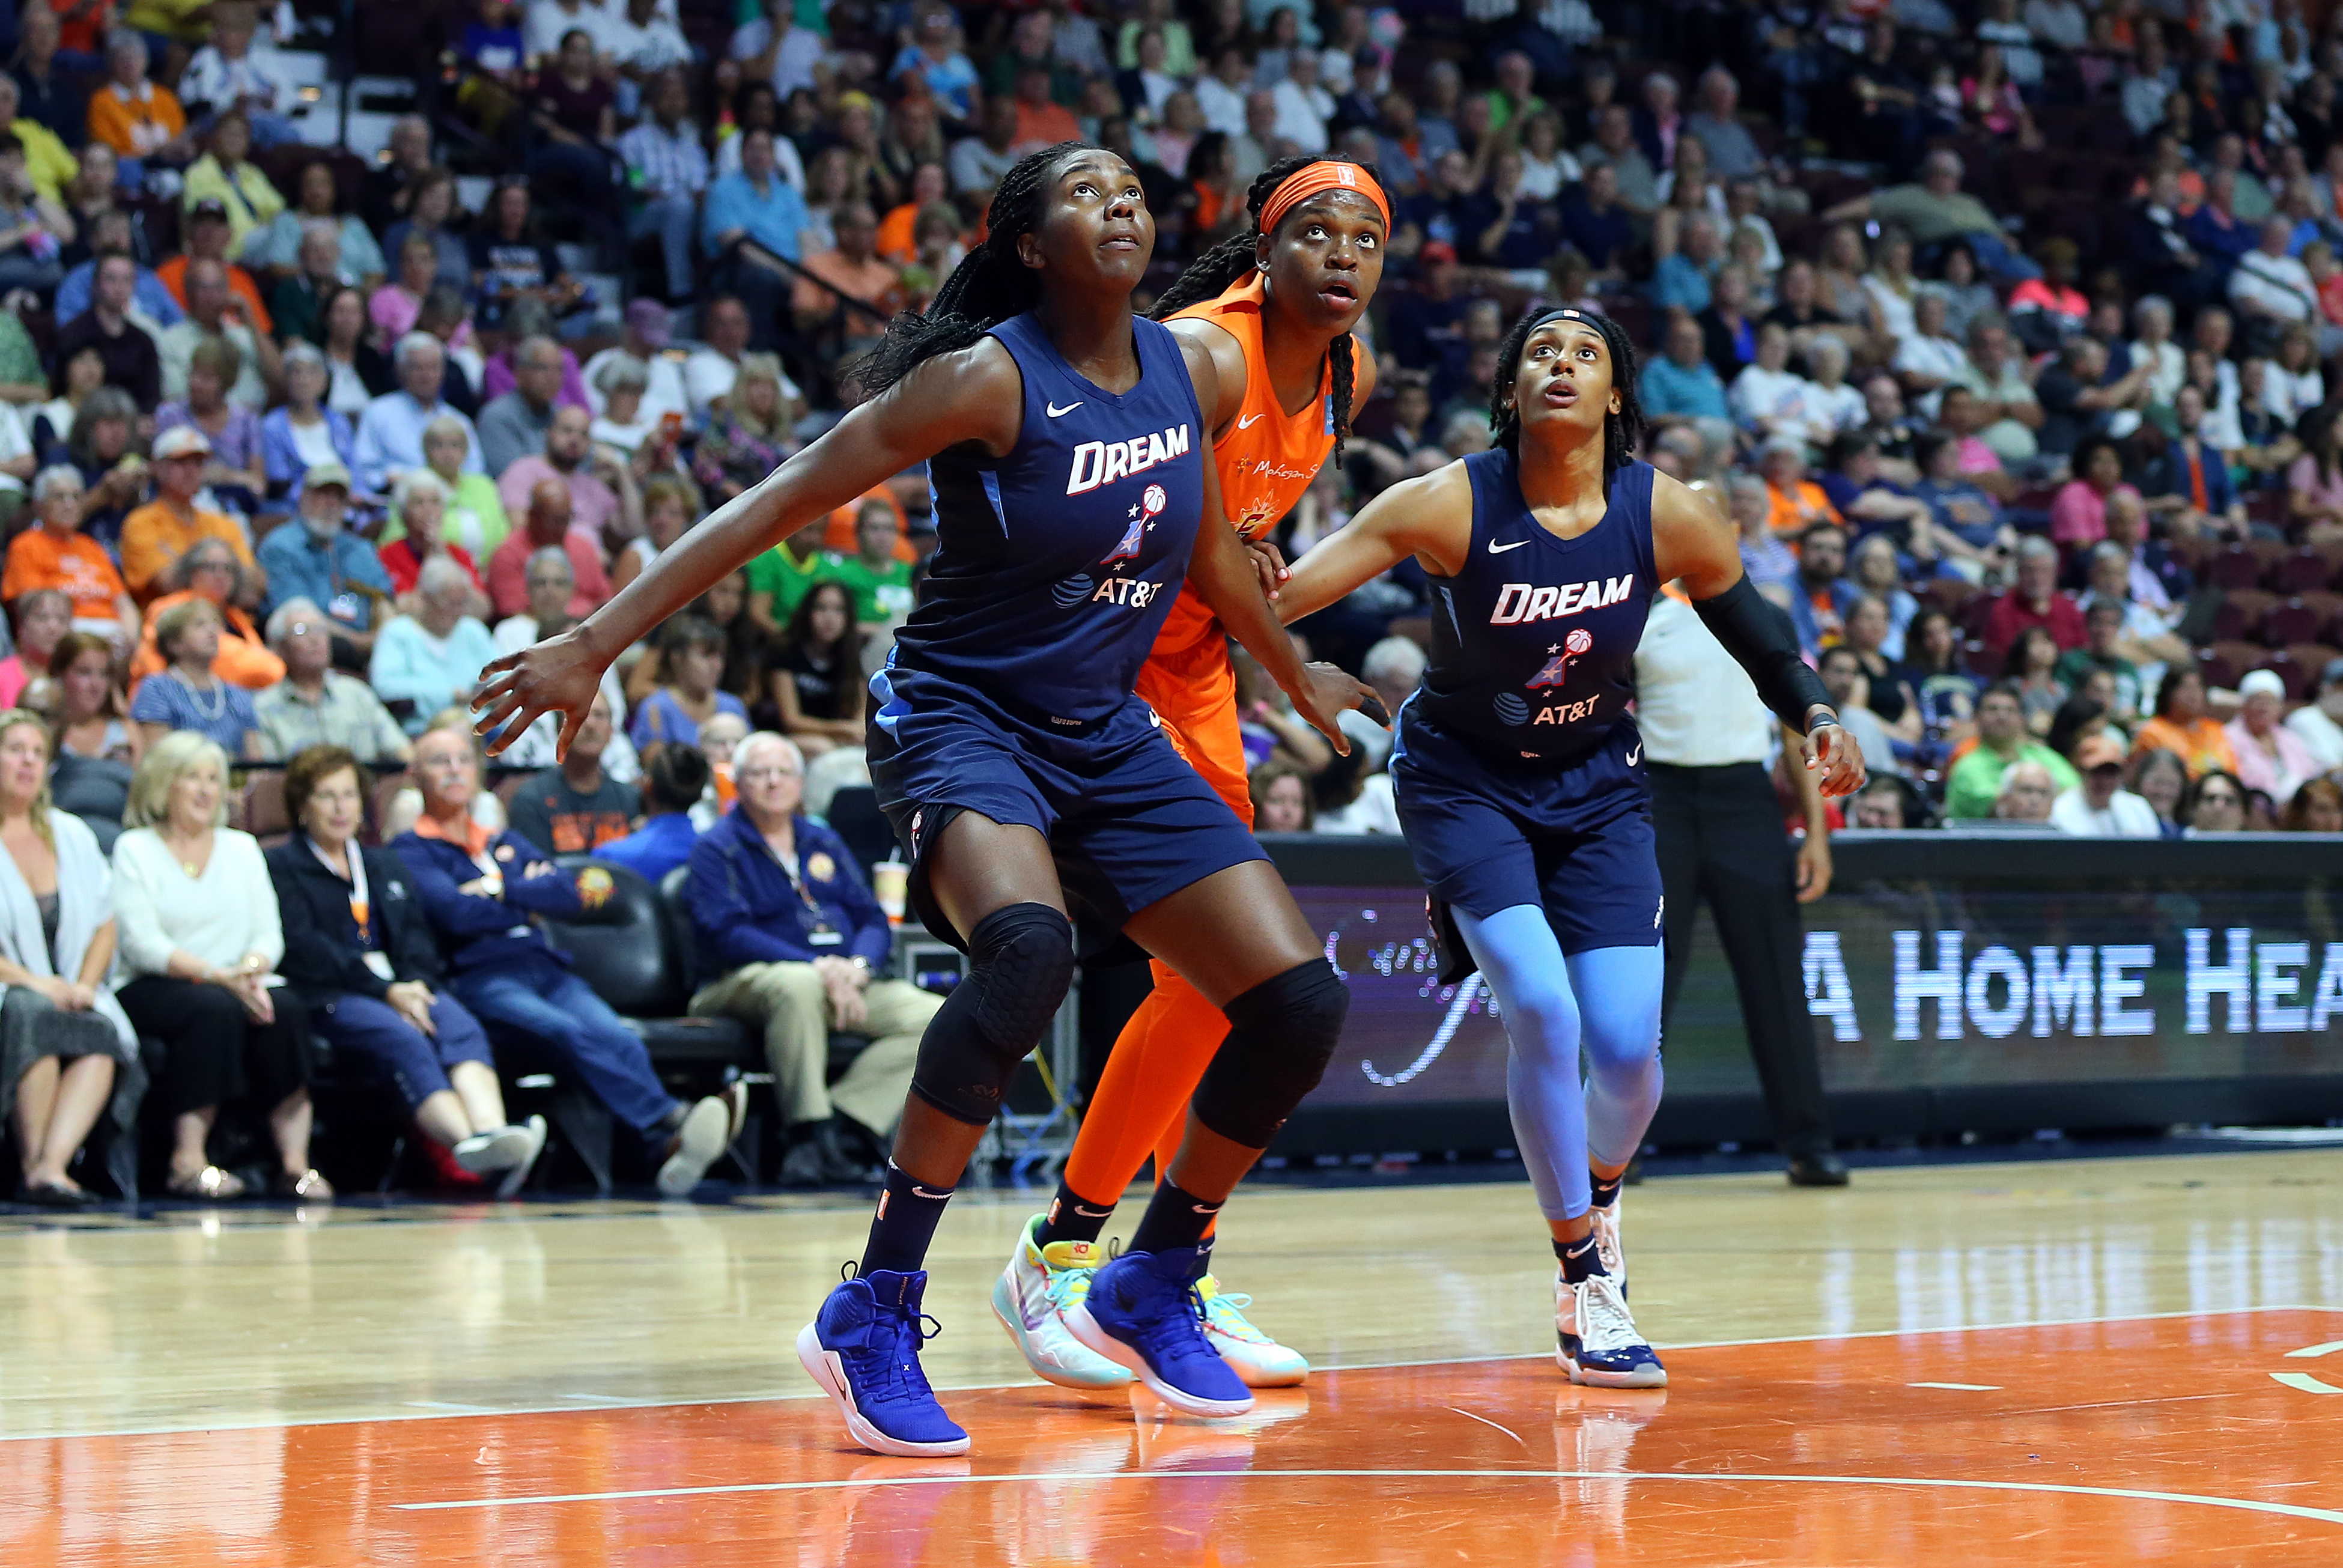 WNBA: JUL 19 Atlanta Dream at Connecticut Sun